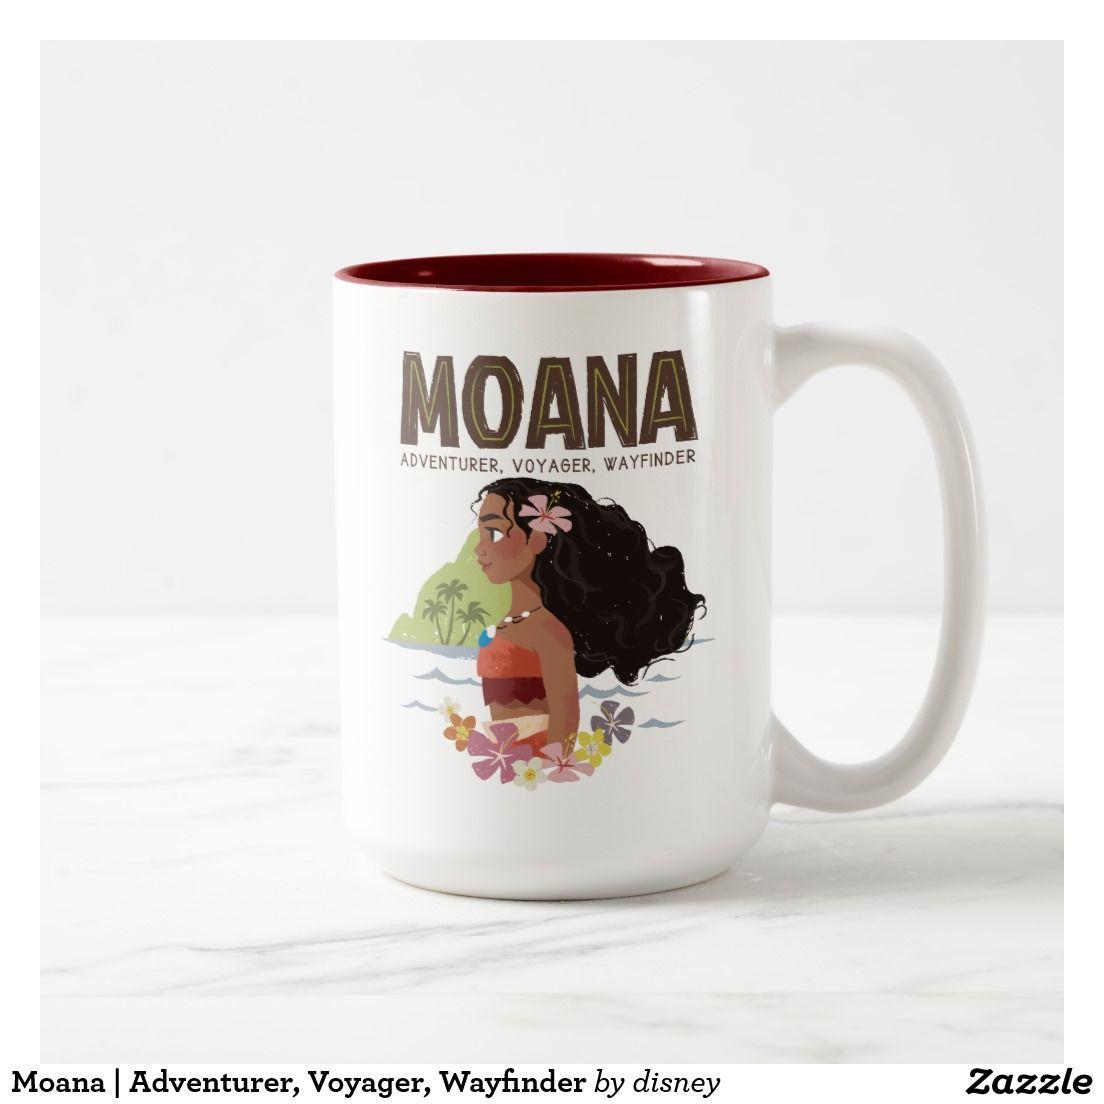 Moana adventurer voyager wayfinder twotone coffee mug